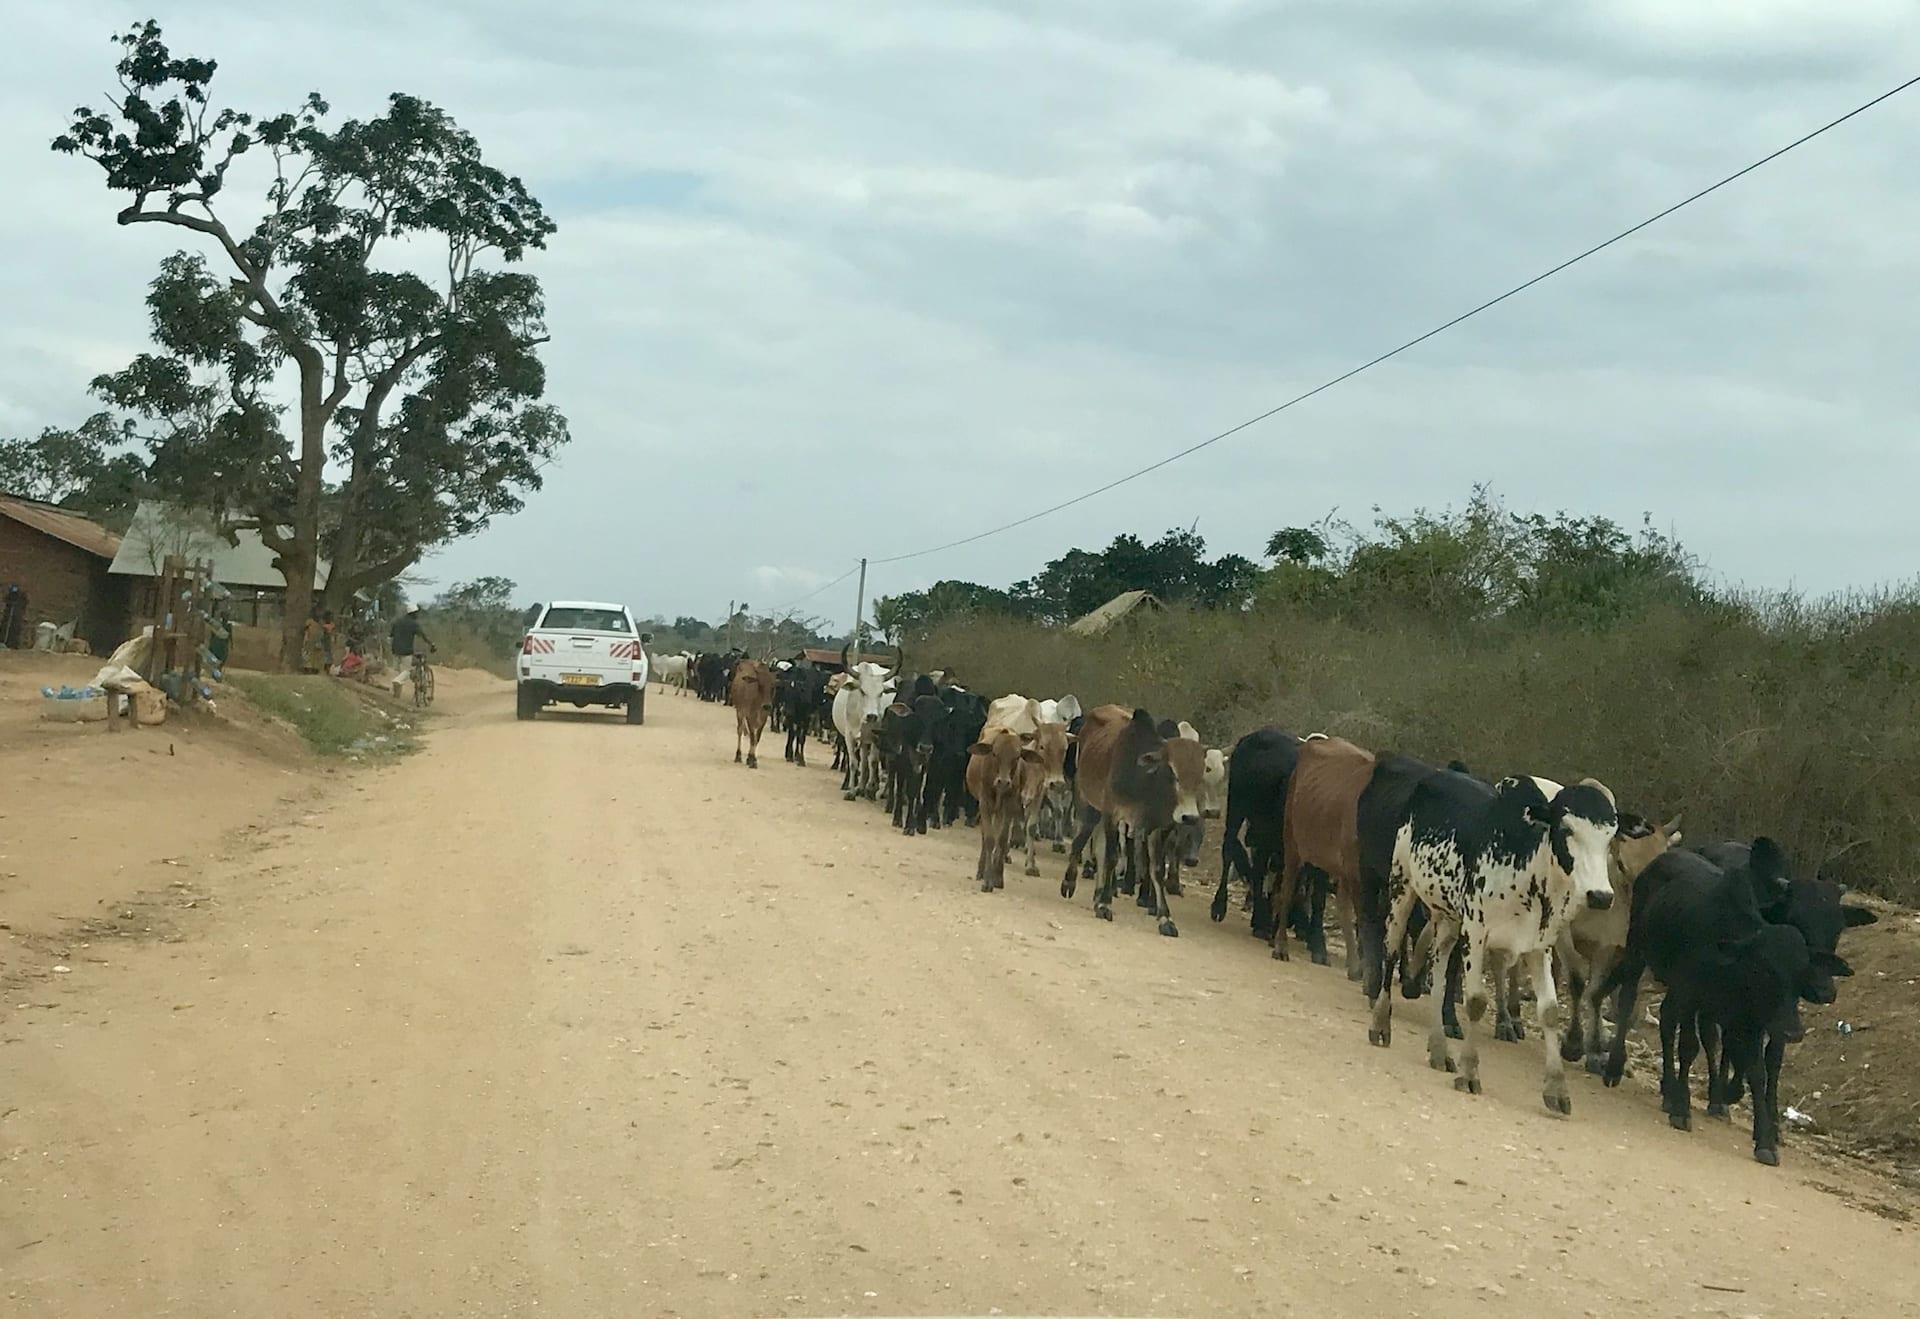 # FOTO - tanzania selfdrive - Route Mikumi - Kijongo Bay_4713